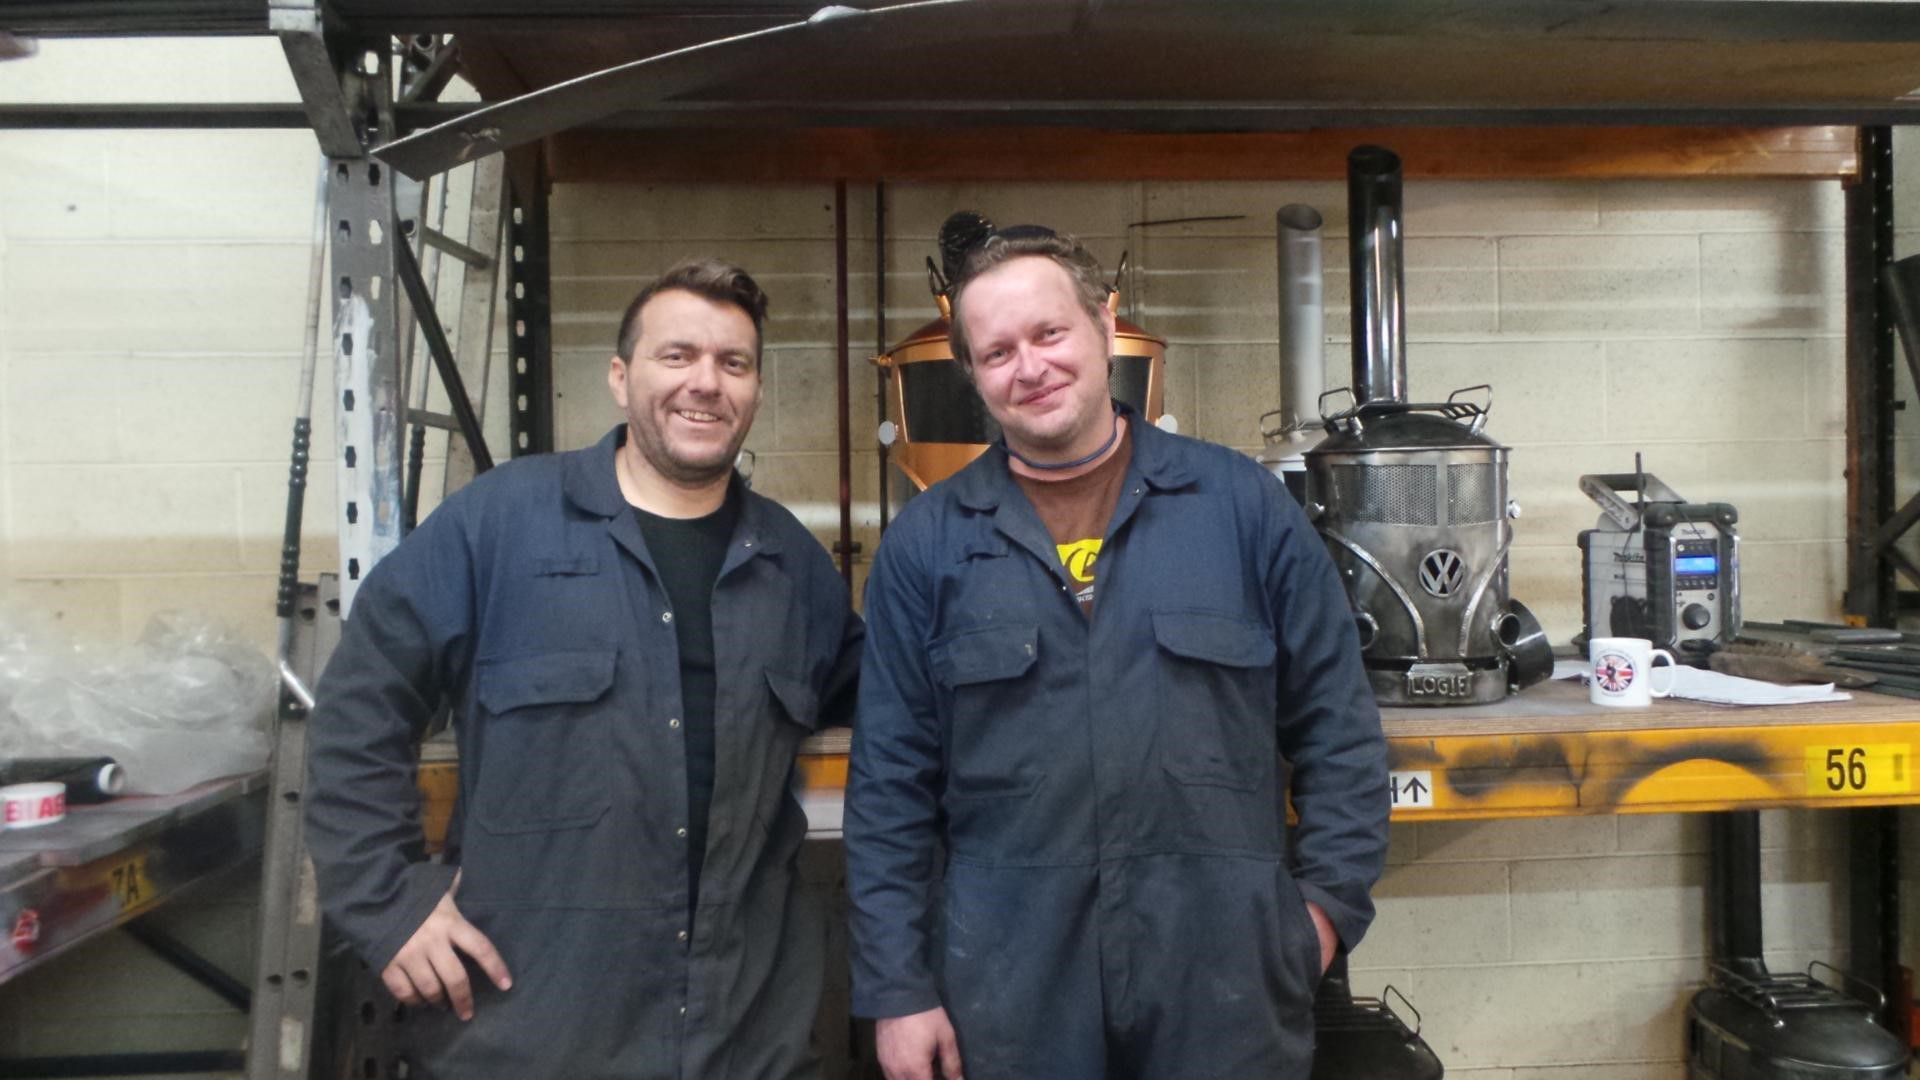 Pete and Shaun, creators of Volkswagen Camper Van log burners